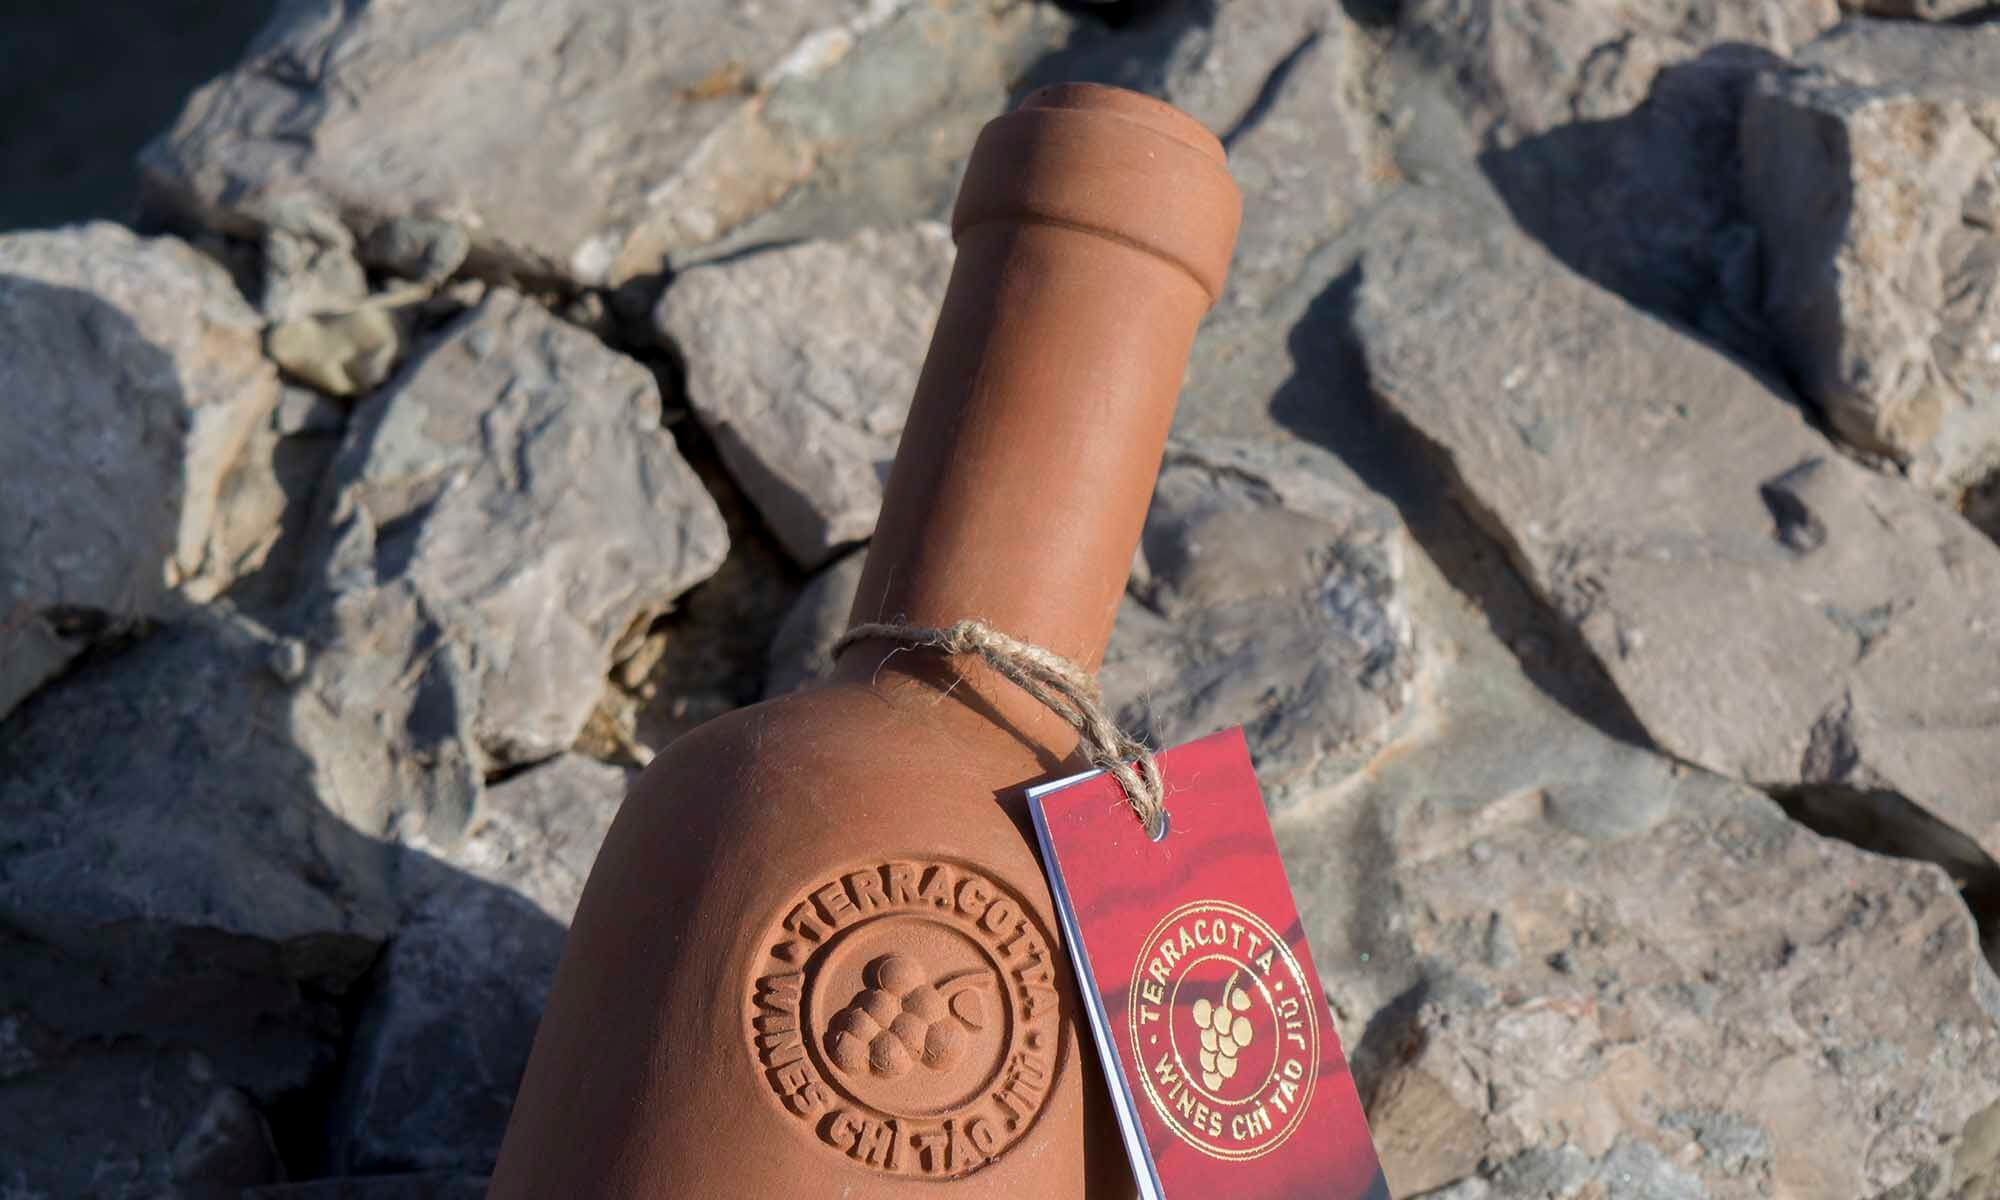 La marca TerraCotta Wines